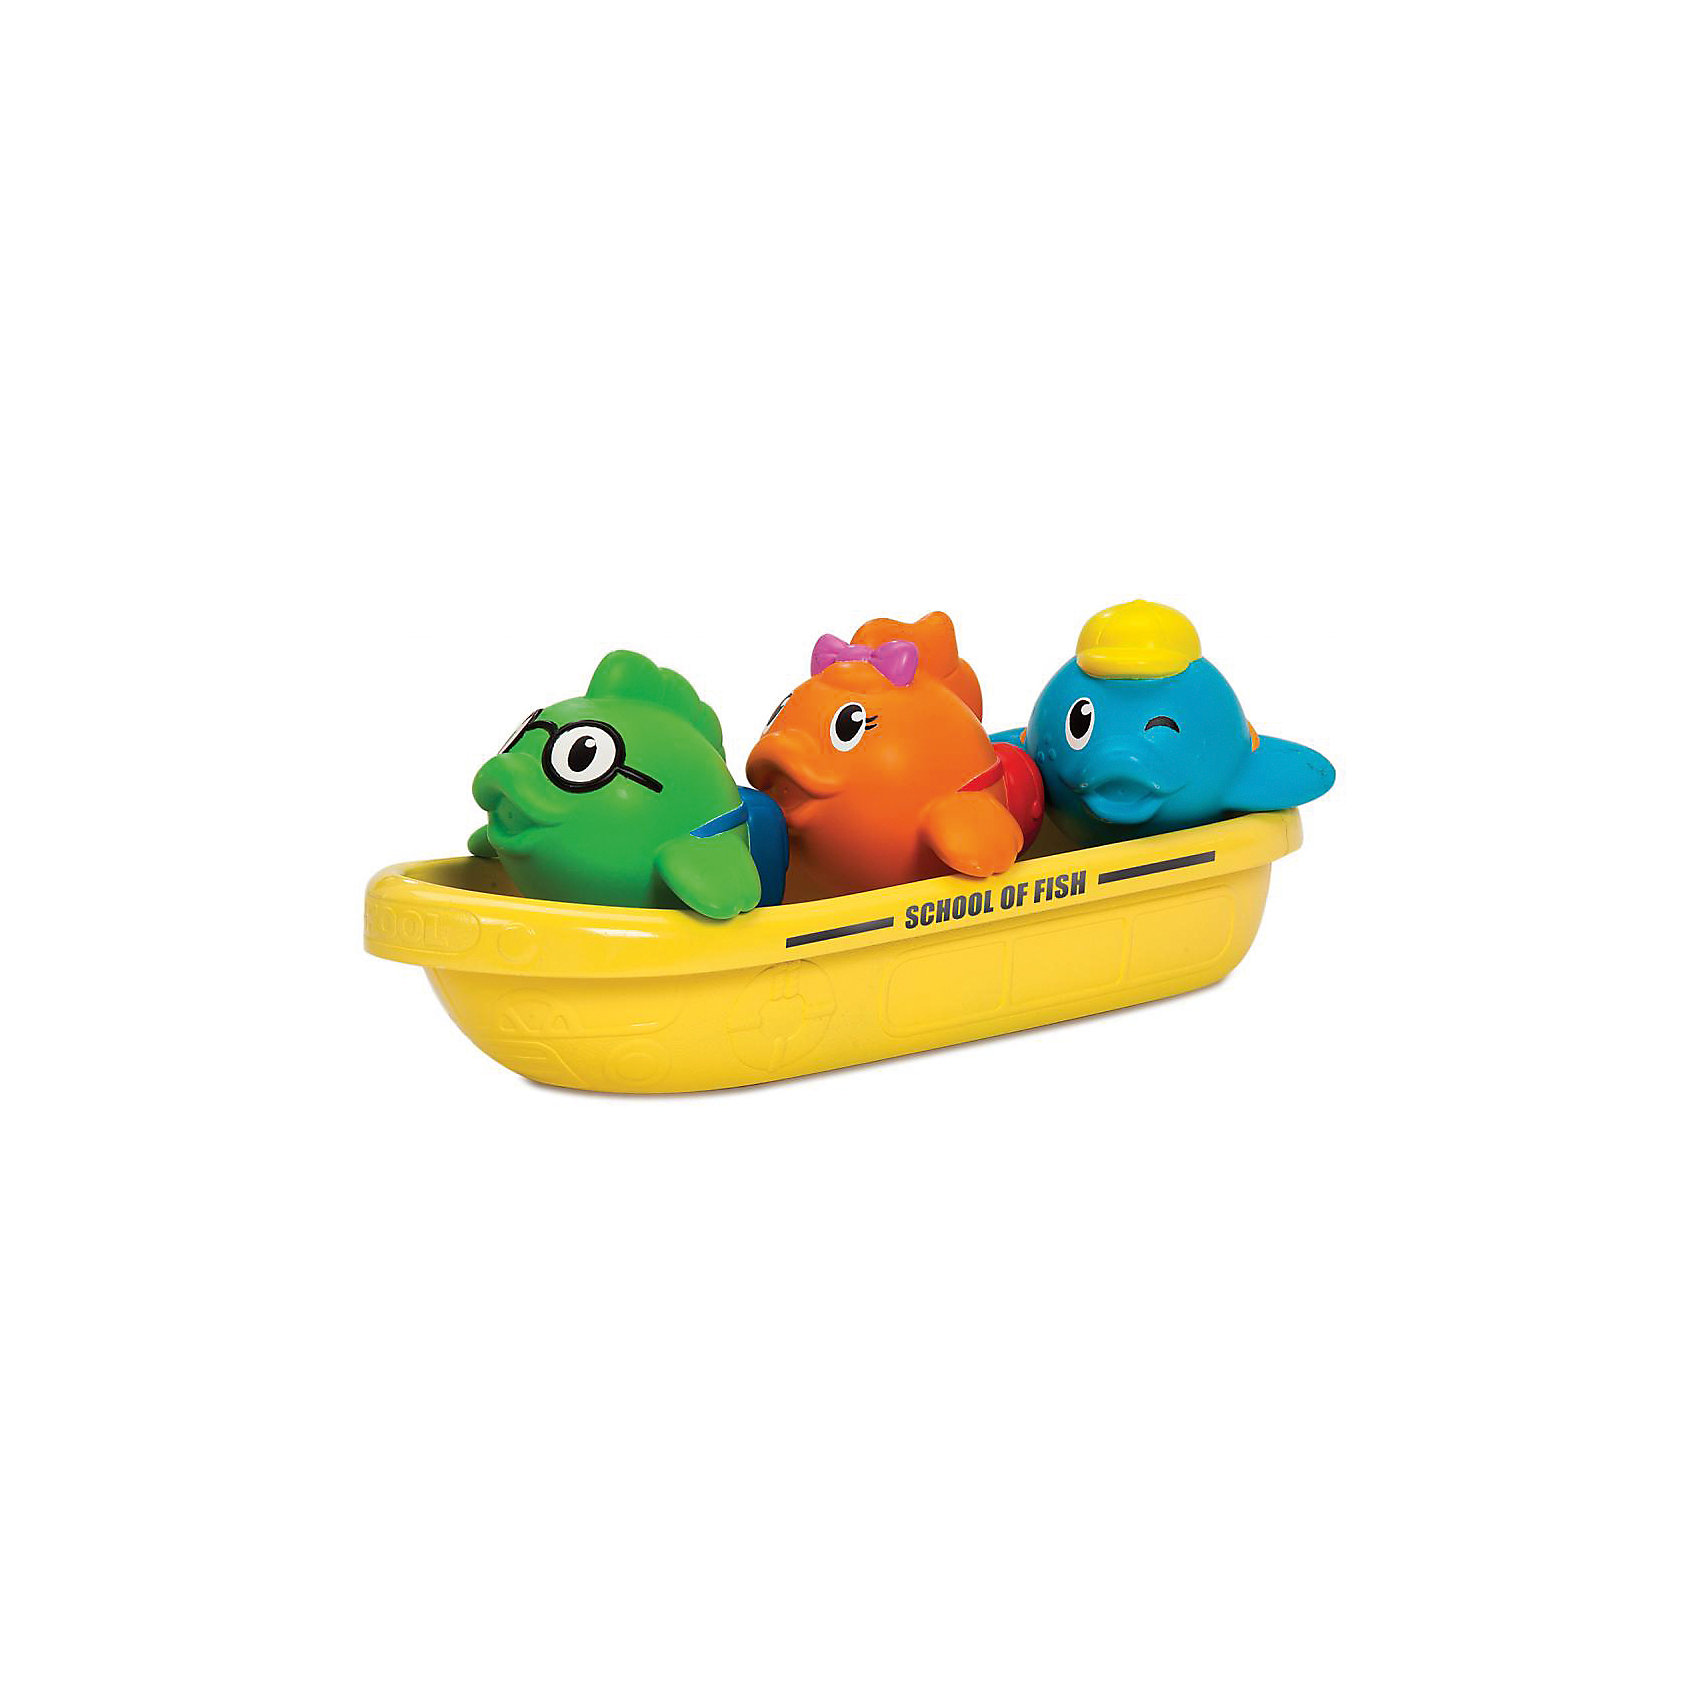 munchkin Игрушка для ванны Школа рыбок 12+, Munchkin munchkin игрушка для ванны школа рыбок